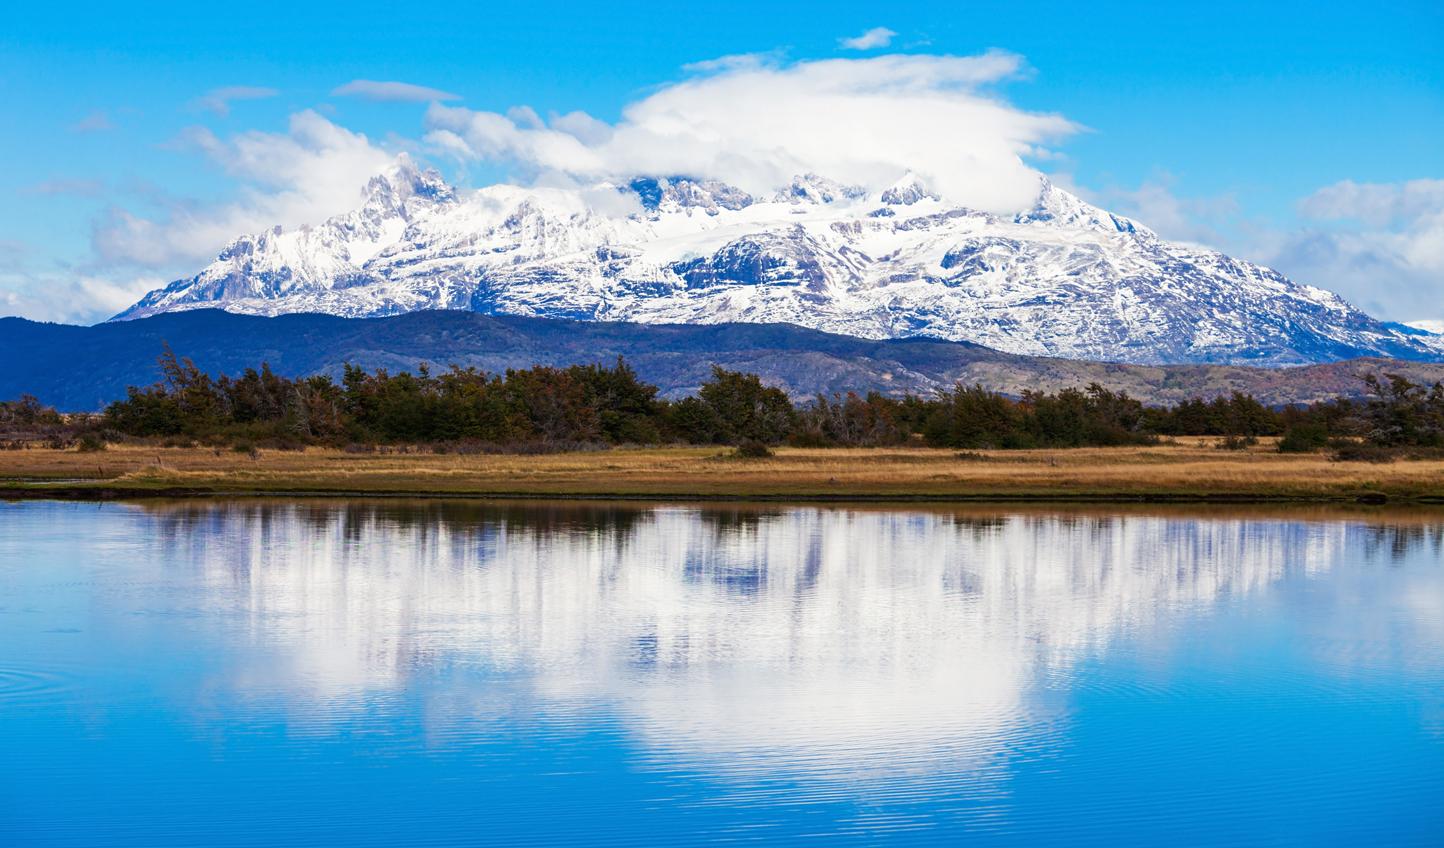 Lago-del-Toro_537070318